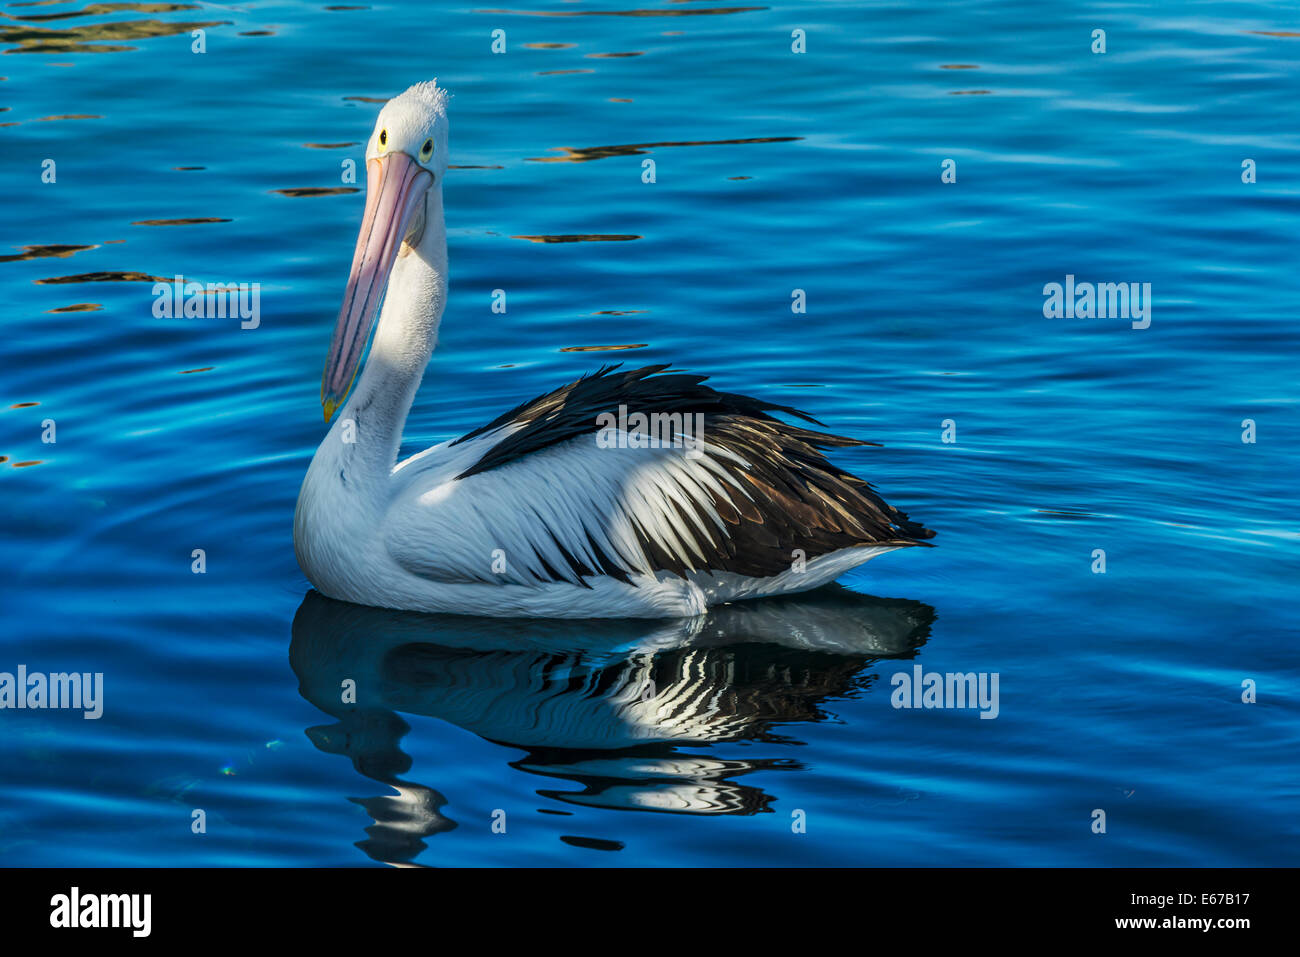 Pelican gliding on water at Quarantine Bay, Eden South Coast NSW Australia - Stock Image